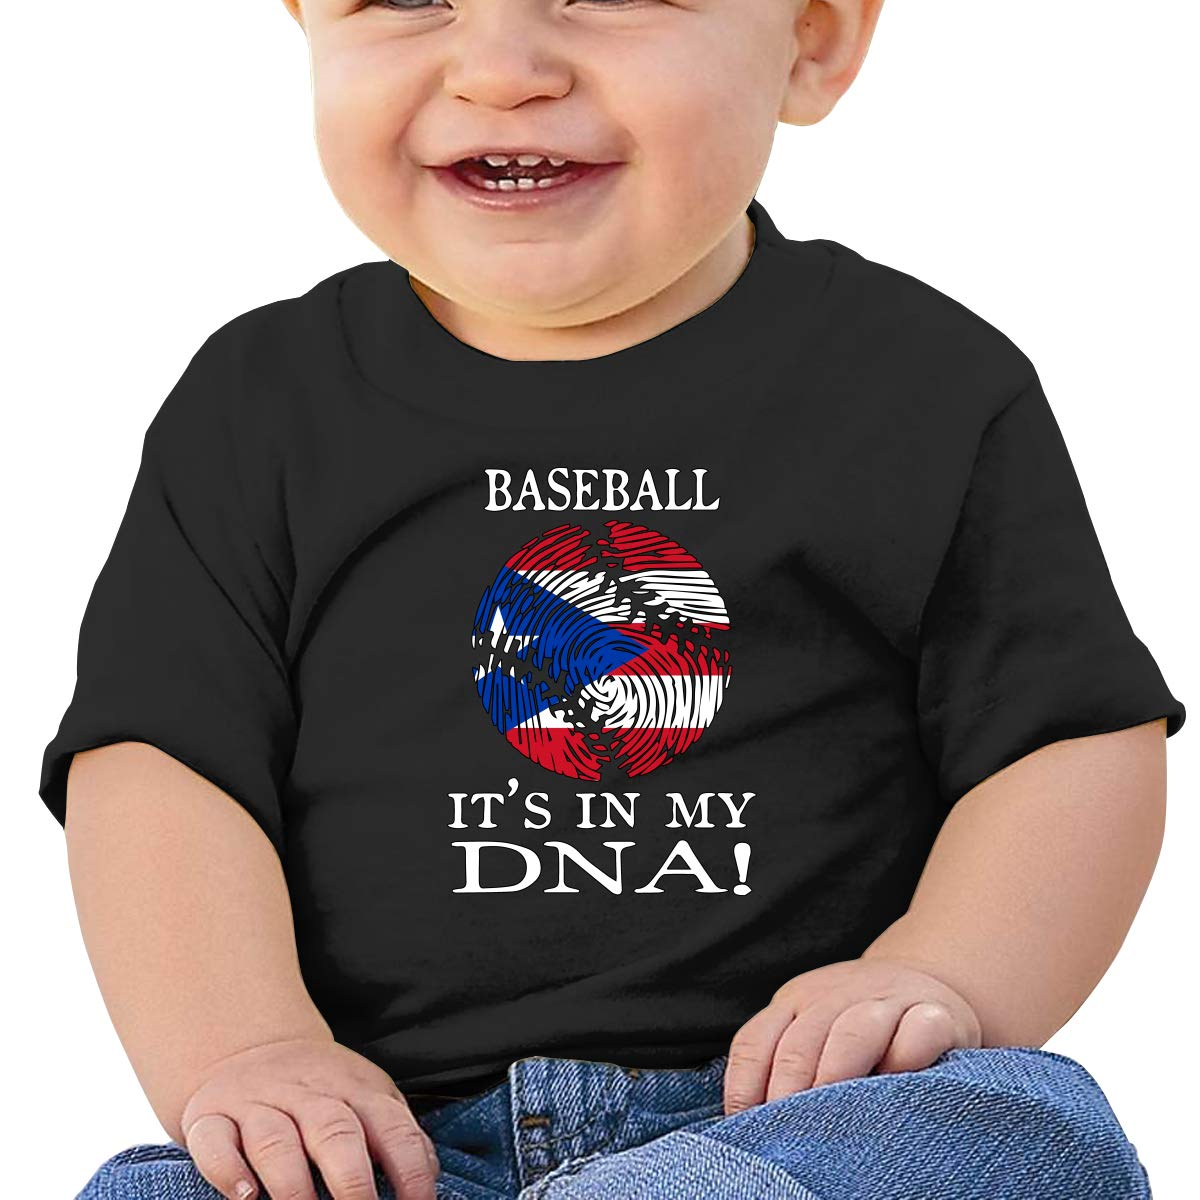 Puerto Rico Flag Baseball DNA Newborn Baby Newborn Short Sleeve Tee Shirt 6-24 Month Soft Tops